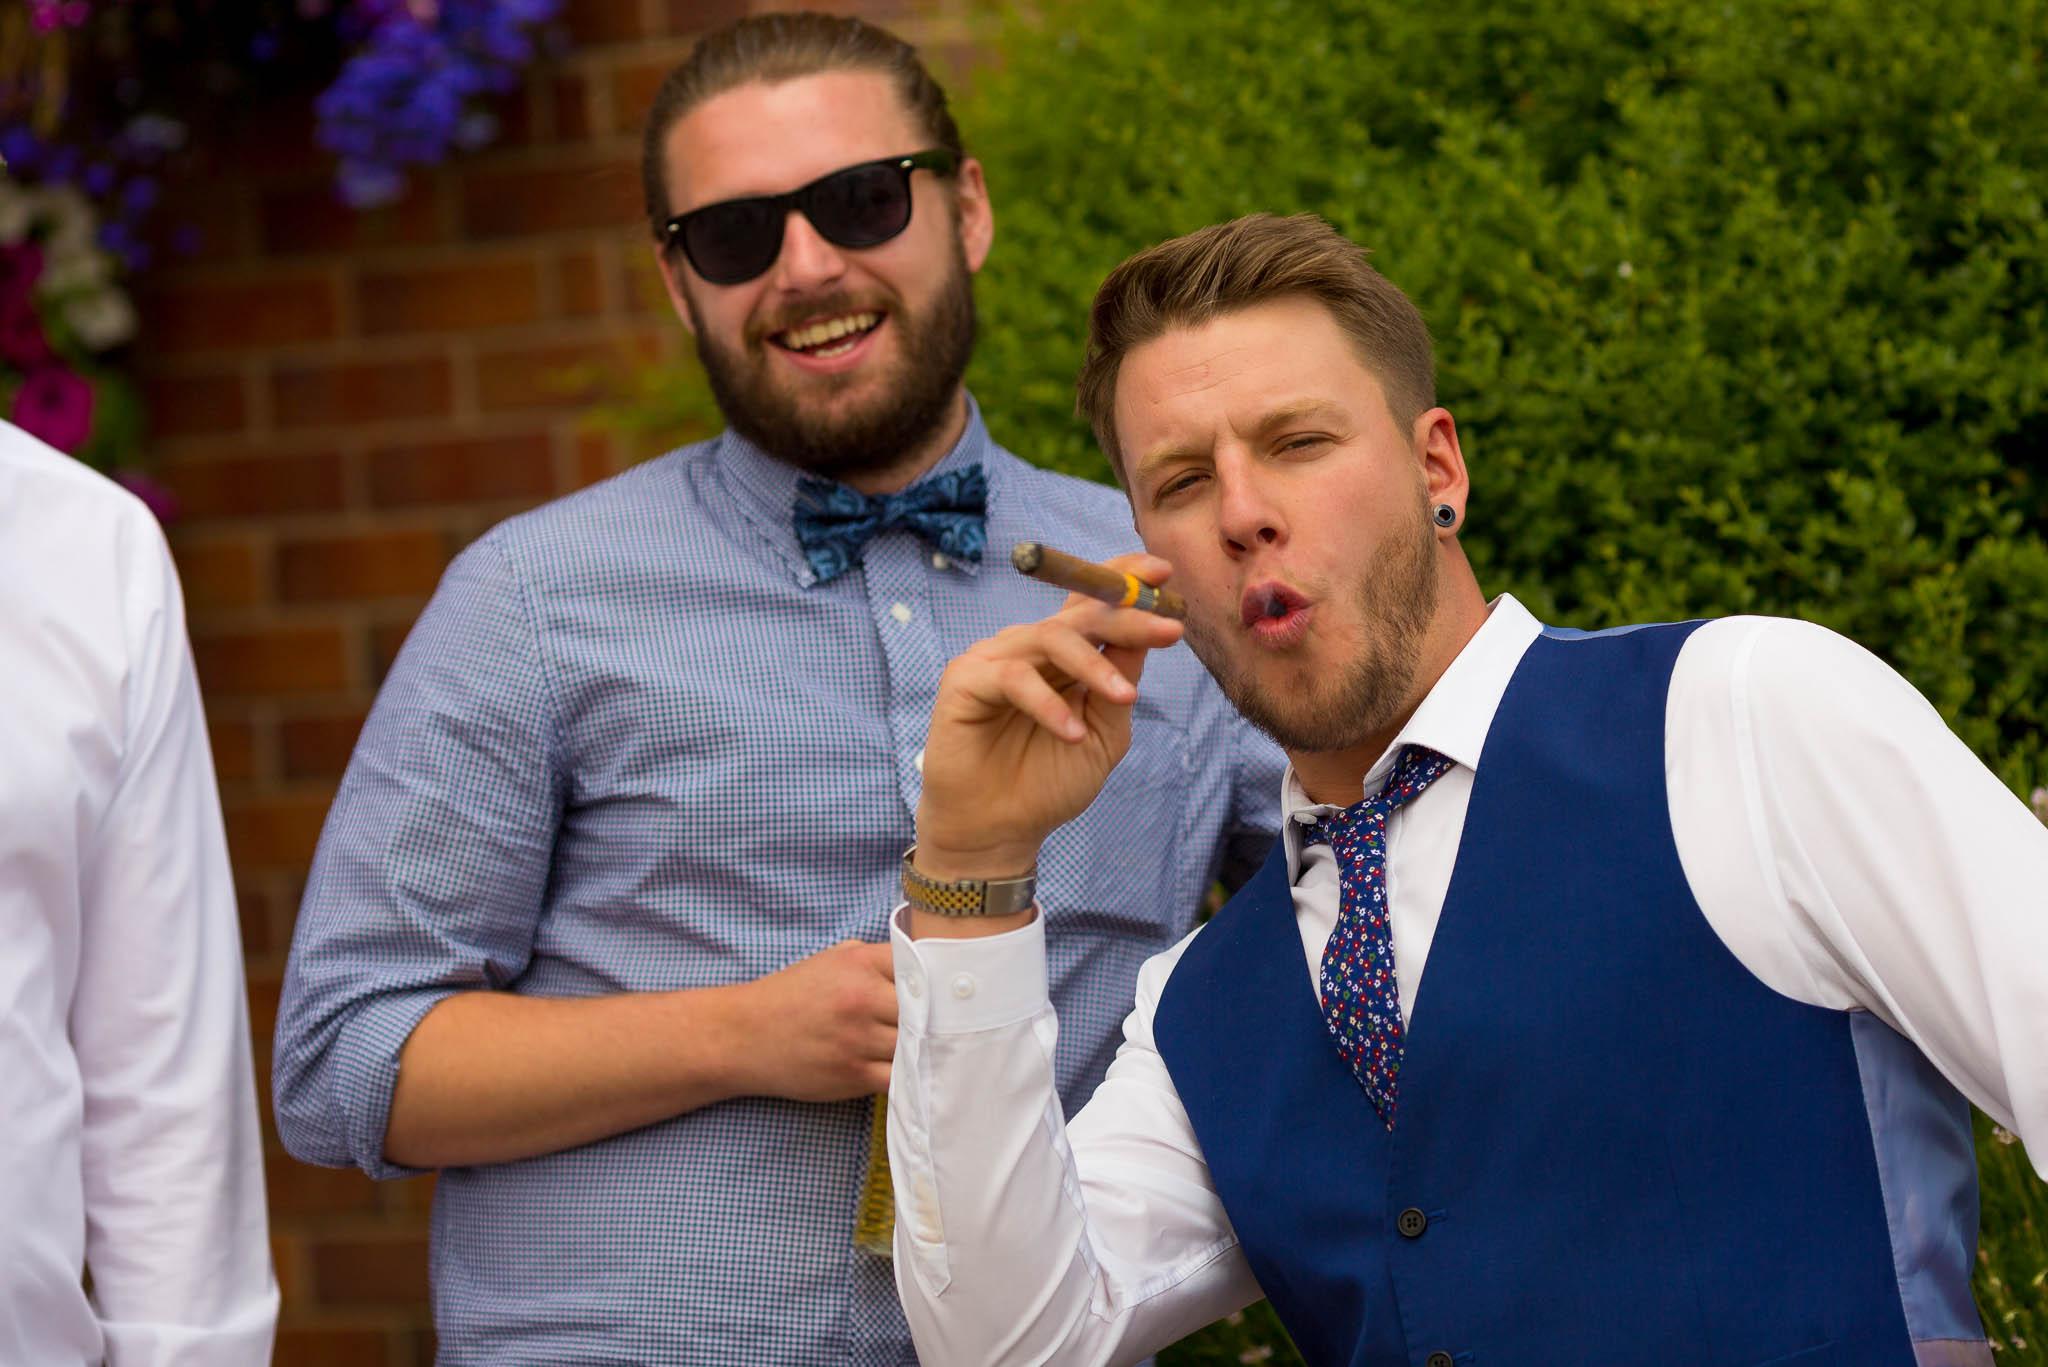 Darrington Golf Club Wedding Photographer92.jpg